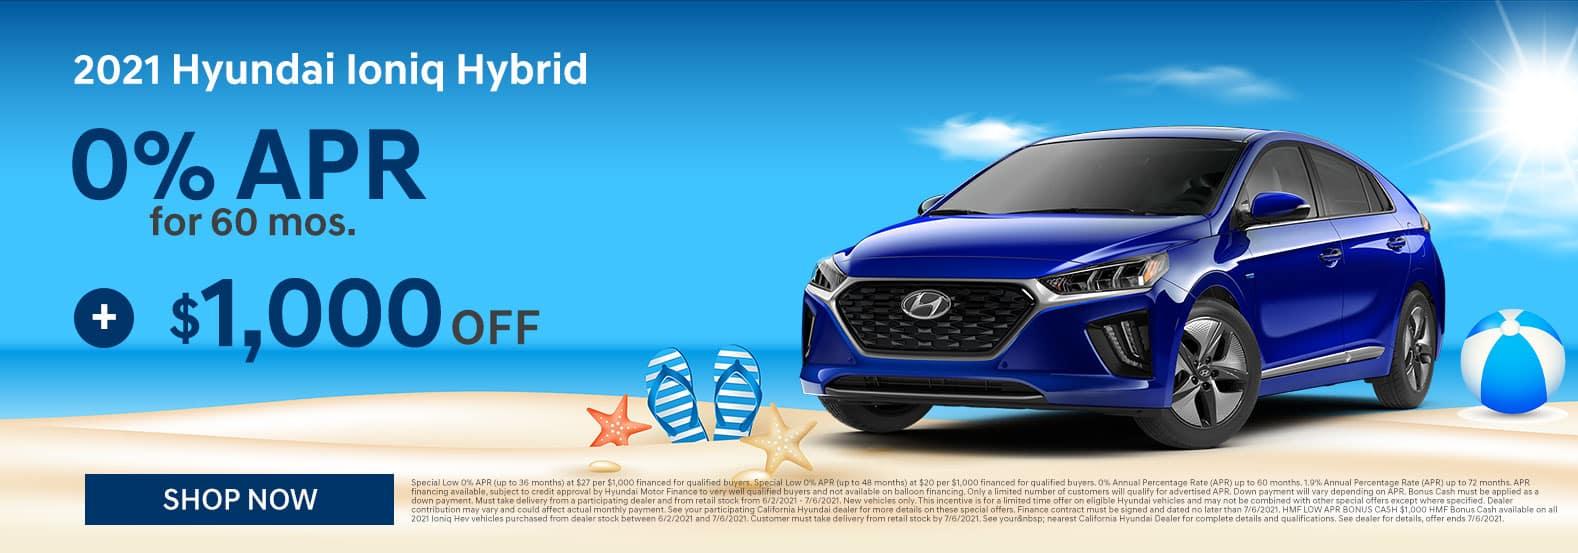 2021 Hyundai Ioniq June Offer